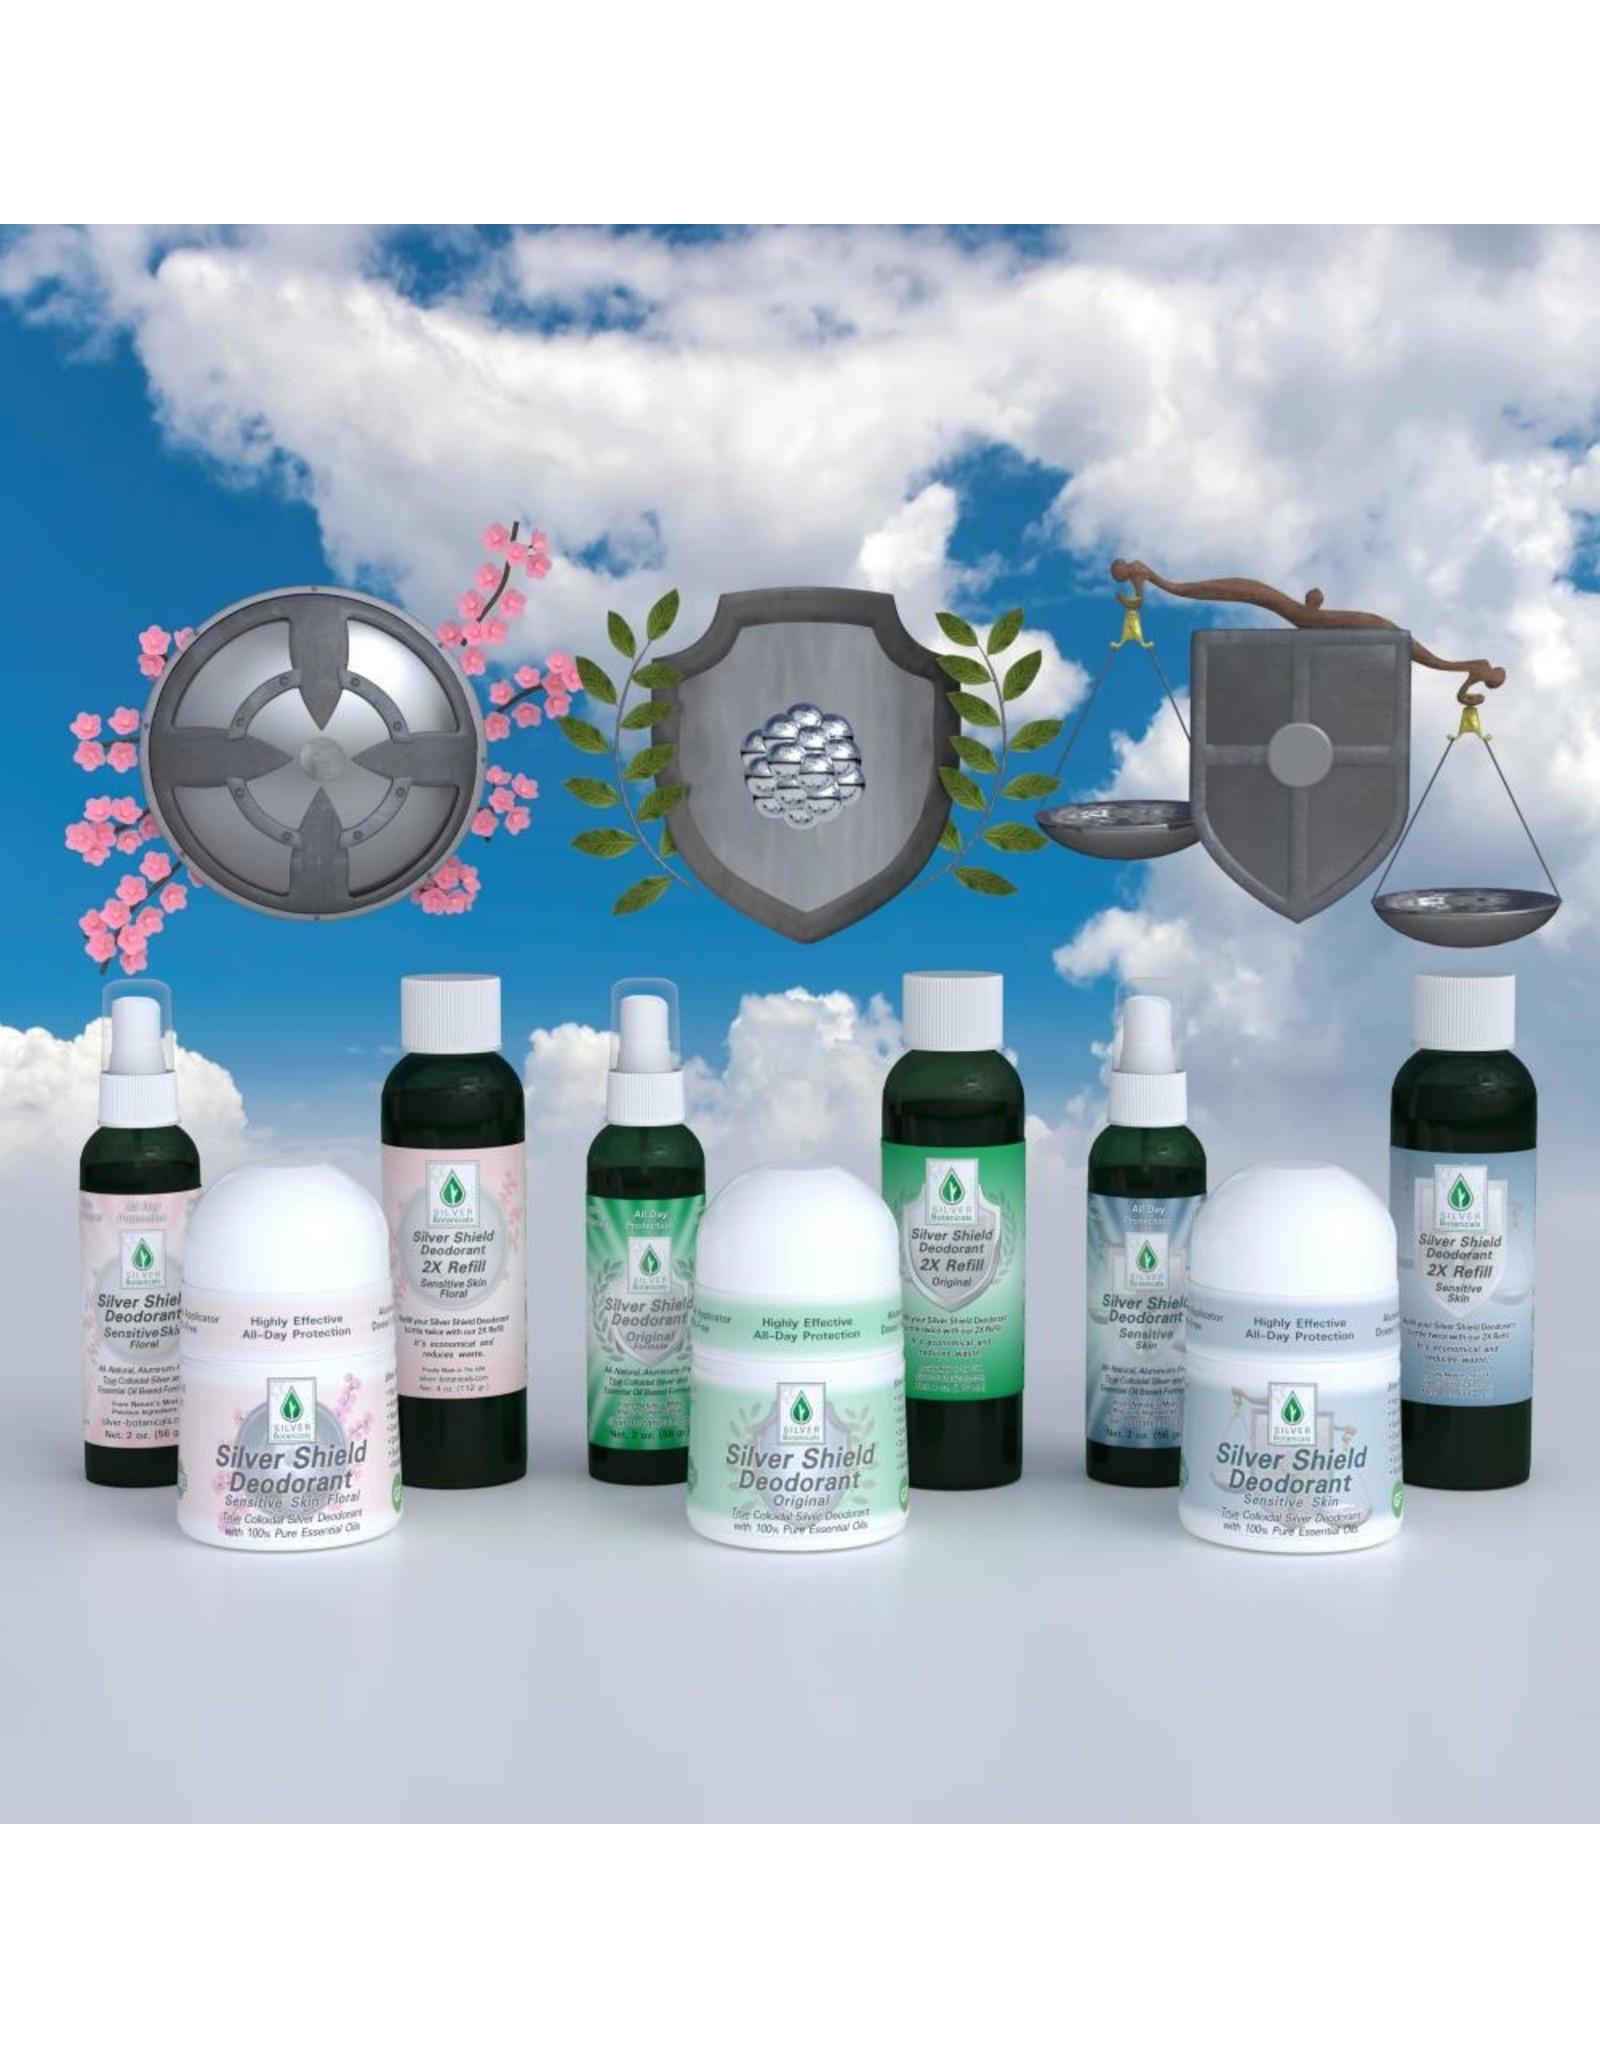 Silver Shield Deodorant, Sensitive, Roll On 2oz